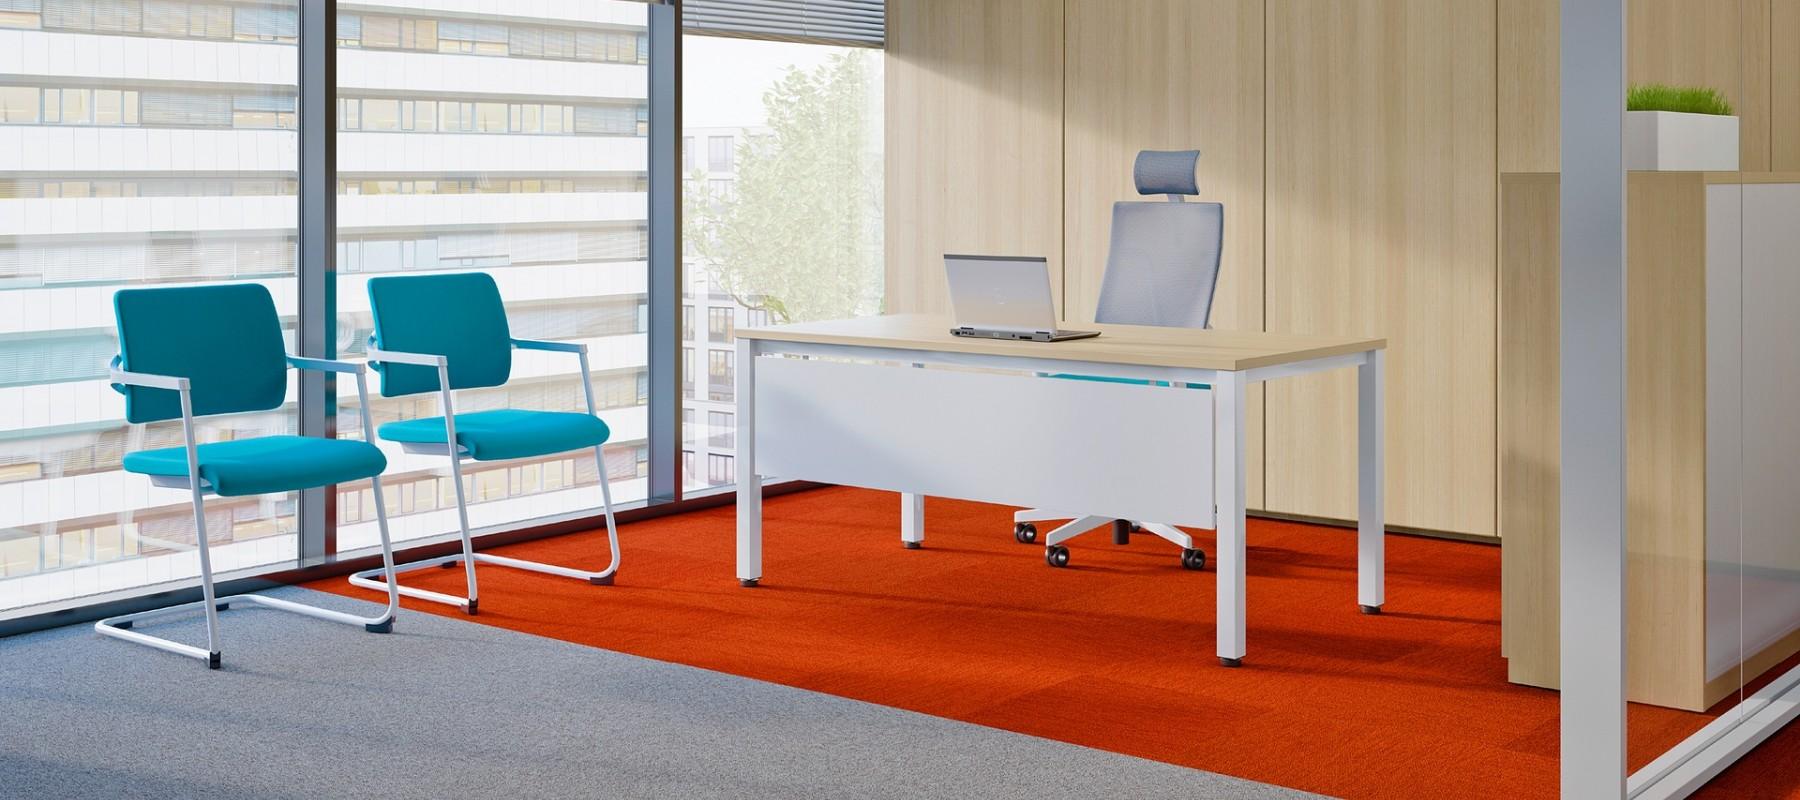 fotele-krzesla-siedziska-4me-2me-aranzacje08